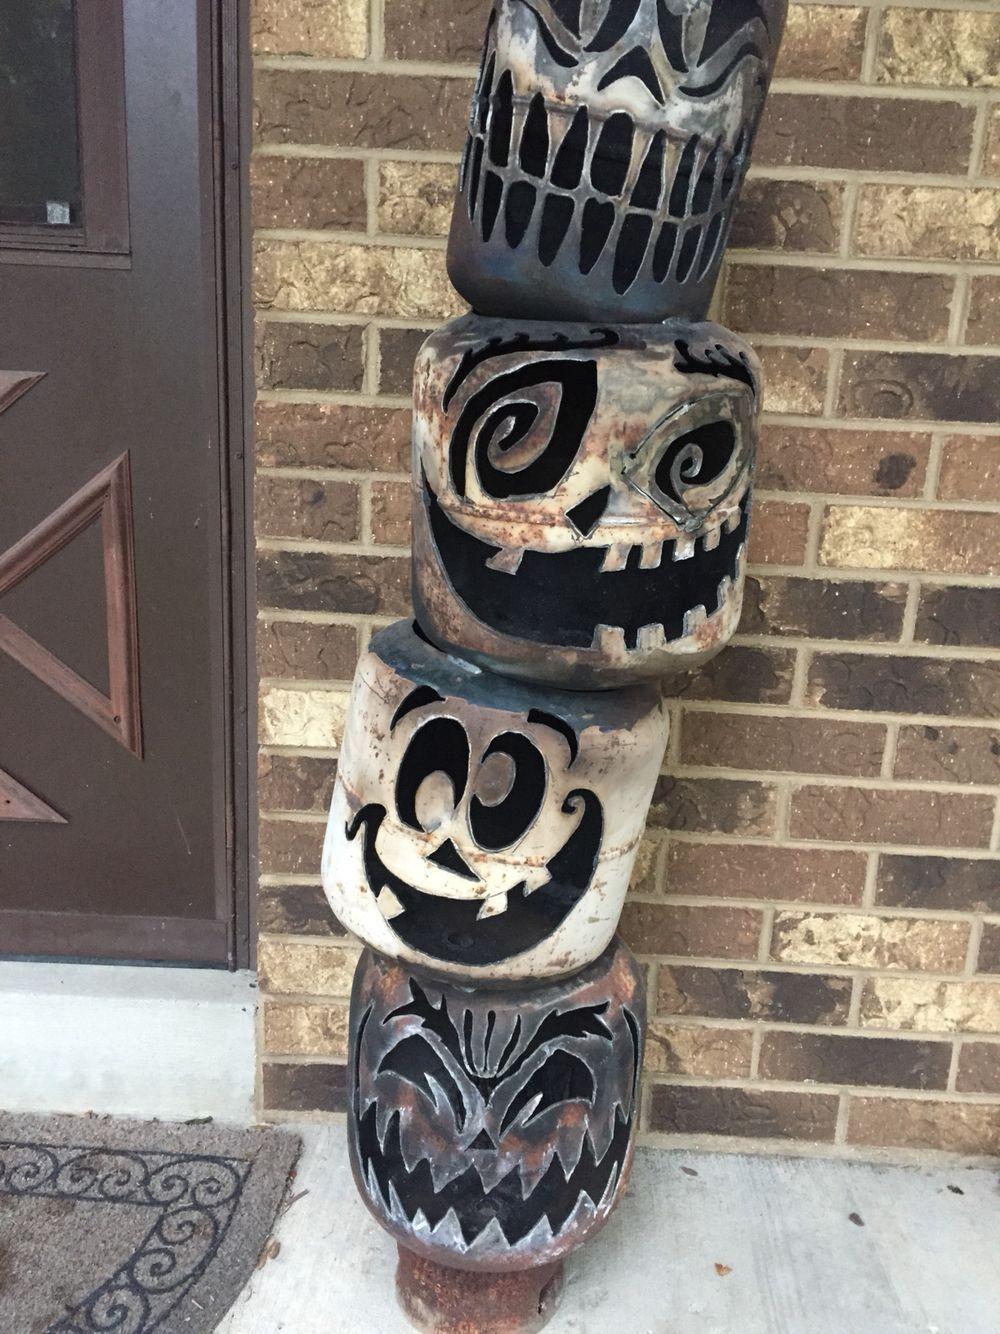 Jack o lantern totem pole in 2020 | Halloween handwerk ...